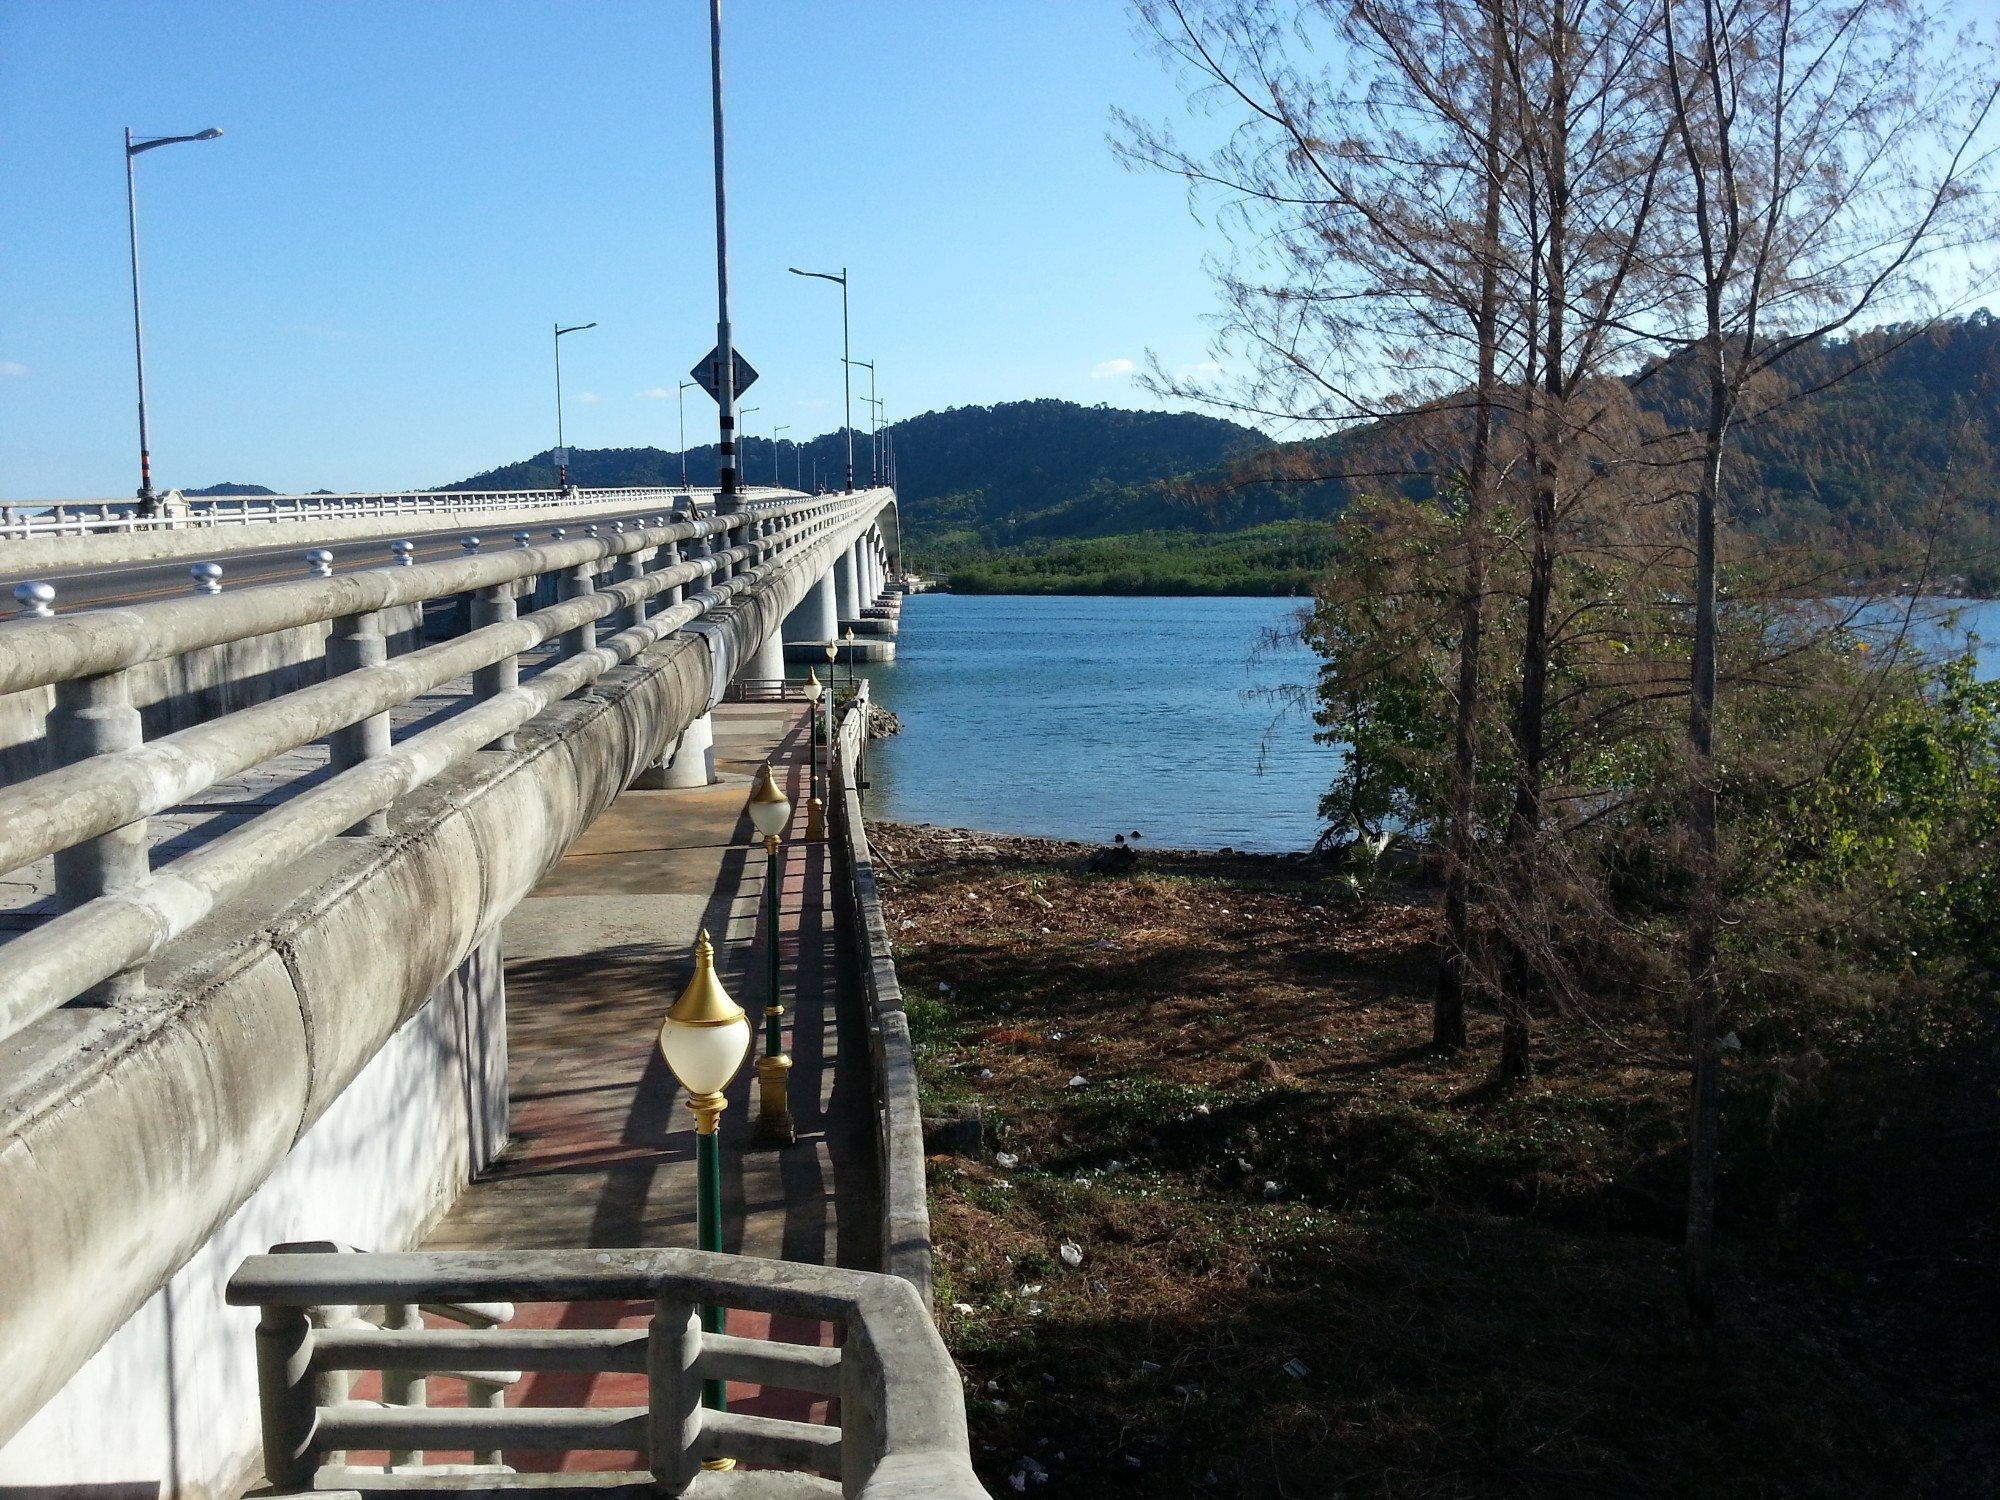 The Siri Lanta Bridge connects Koh Lanta's two main islands